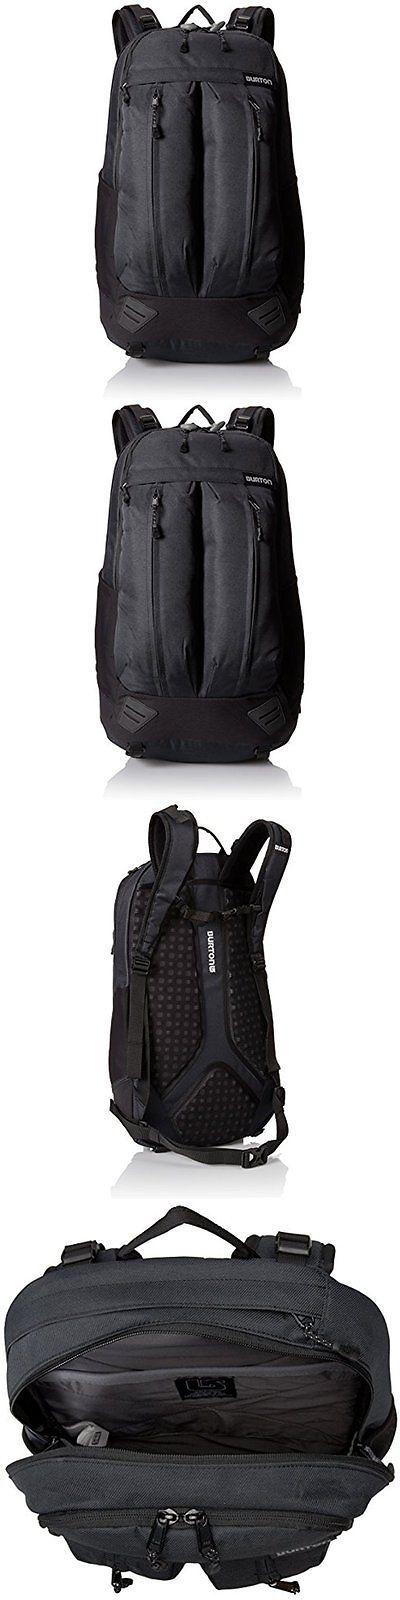 Other Skateboarding Clothing 159079: Burton Bravo Pack, True Black Heather Twill -> BUY IT NOW ONLY: $95.29 on eBay!